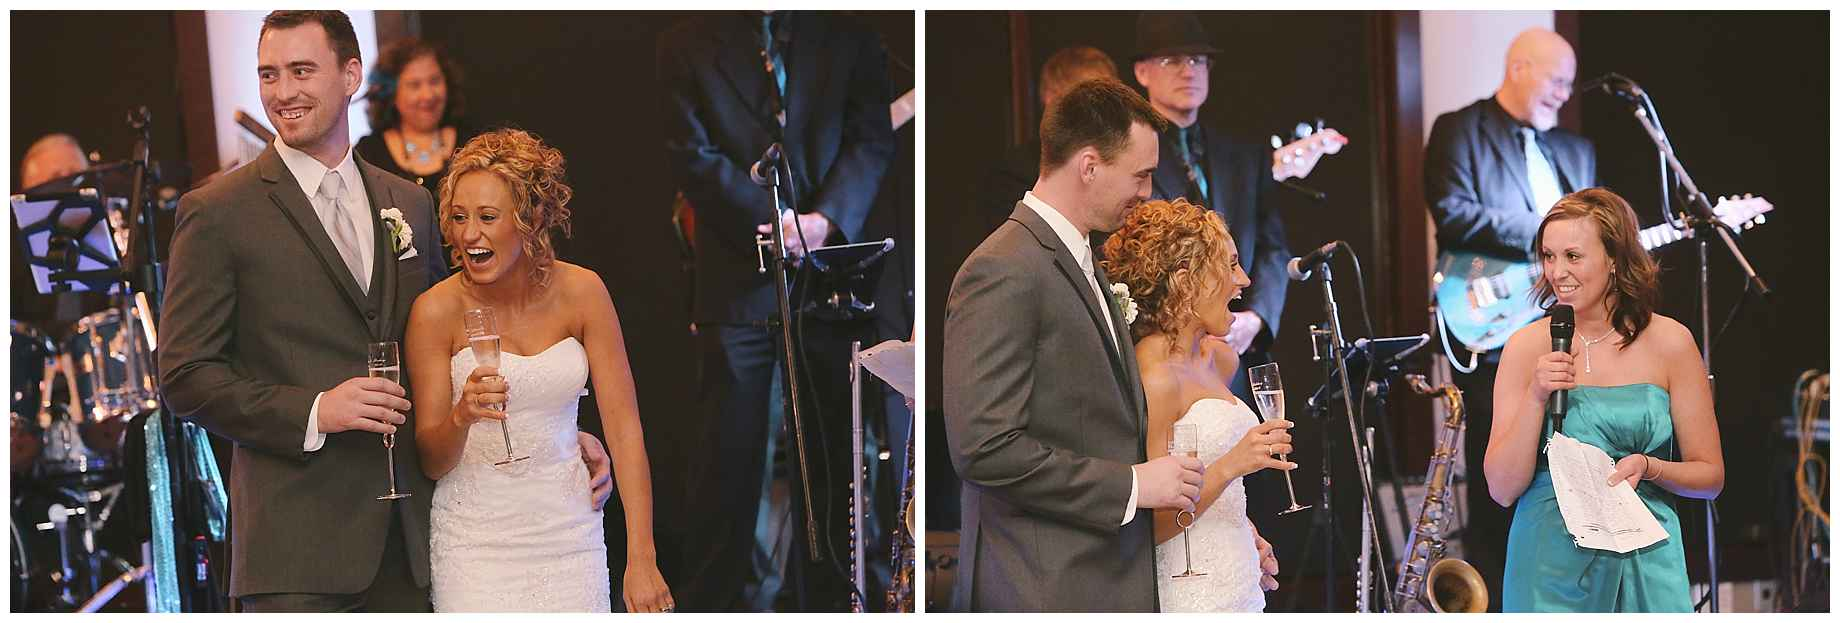 dallas-wedding-photographer-14